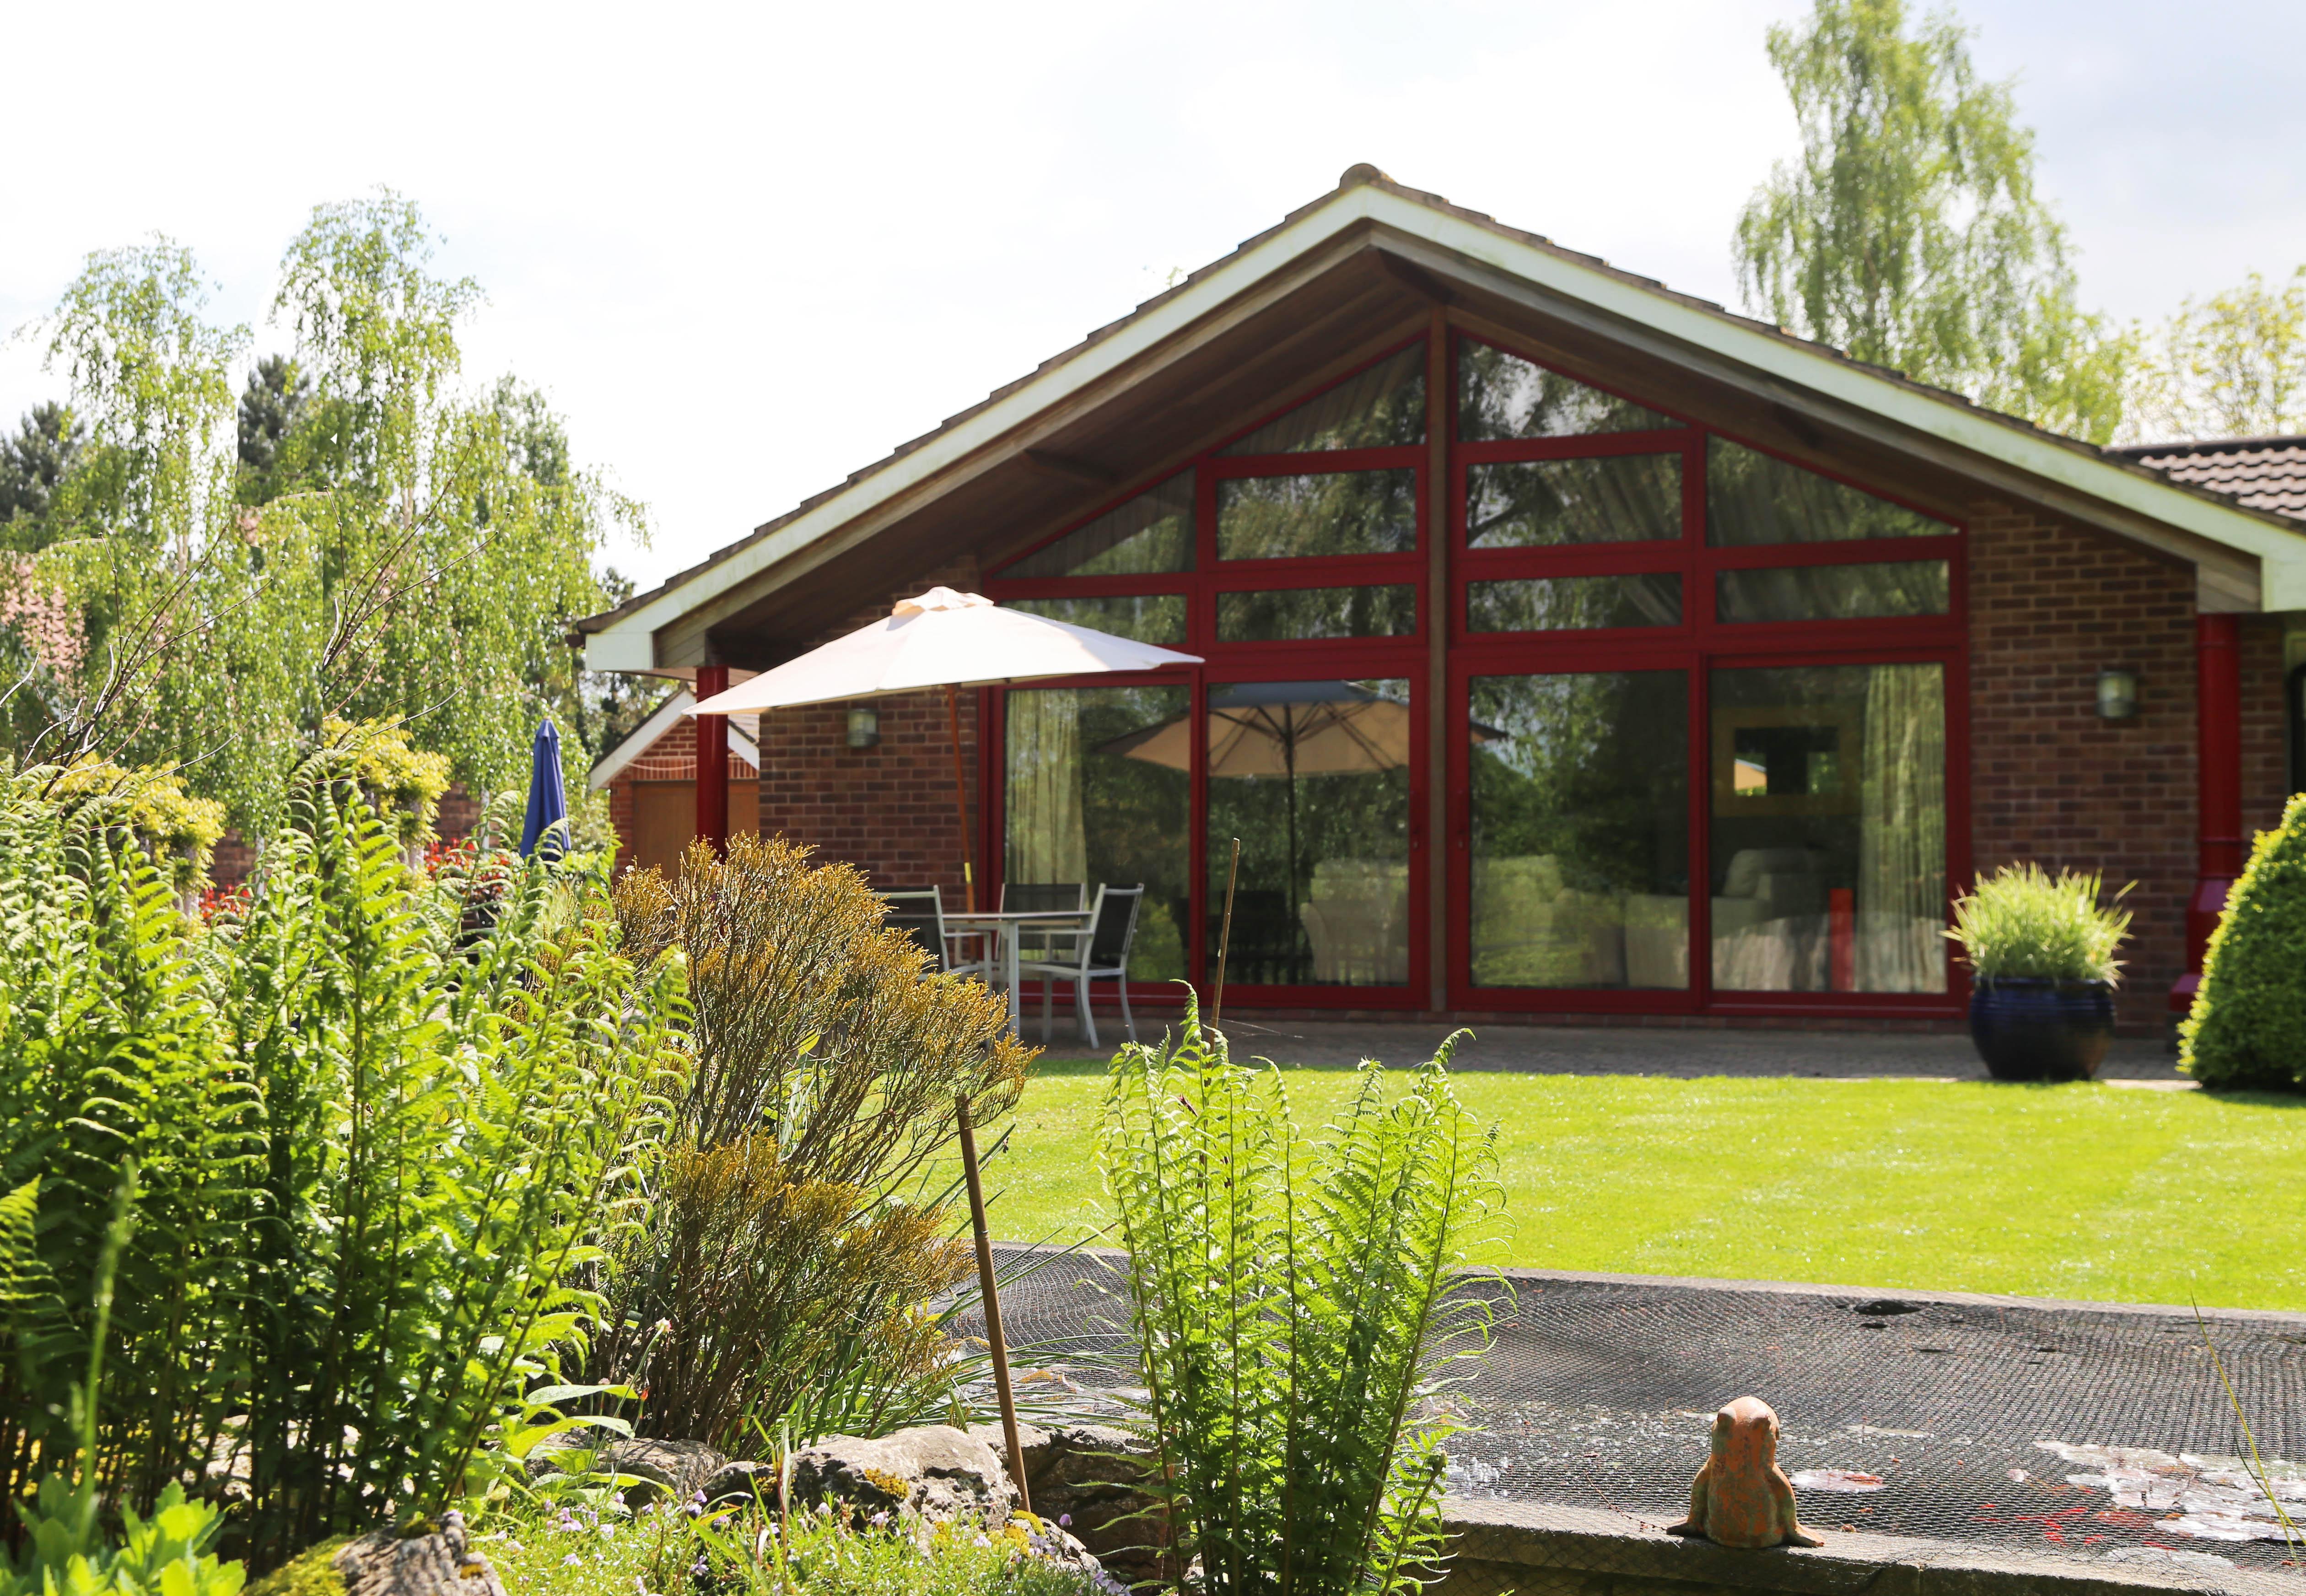 accommodation in norfolk -Surlingham